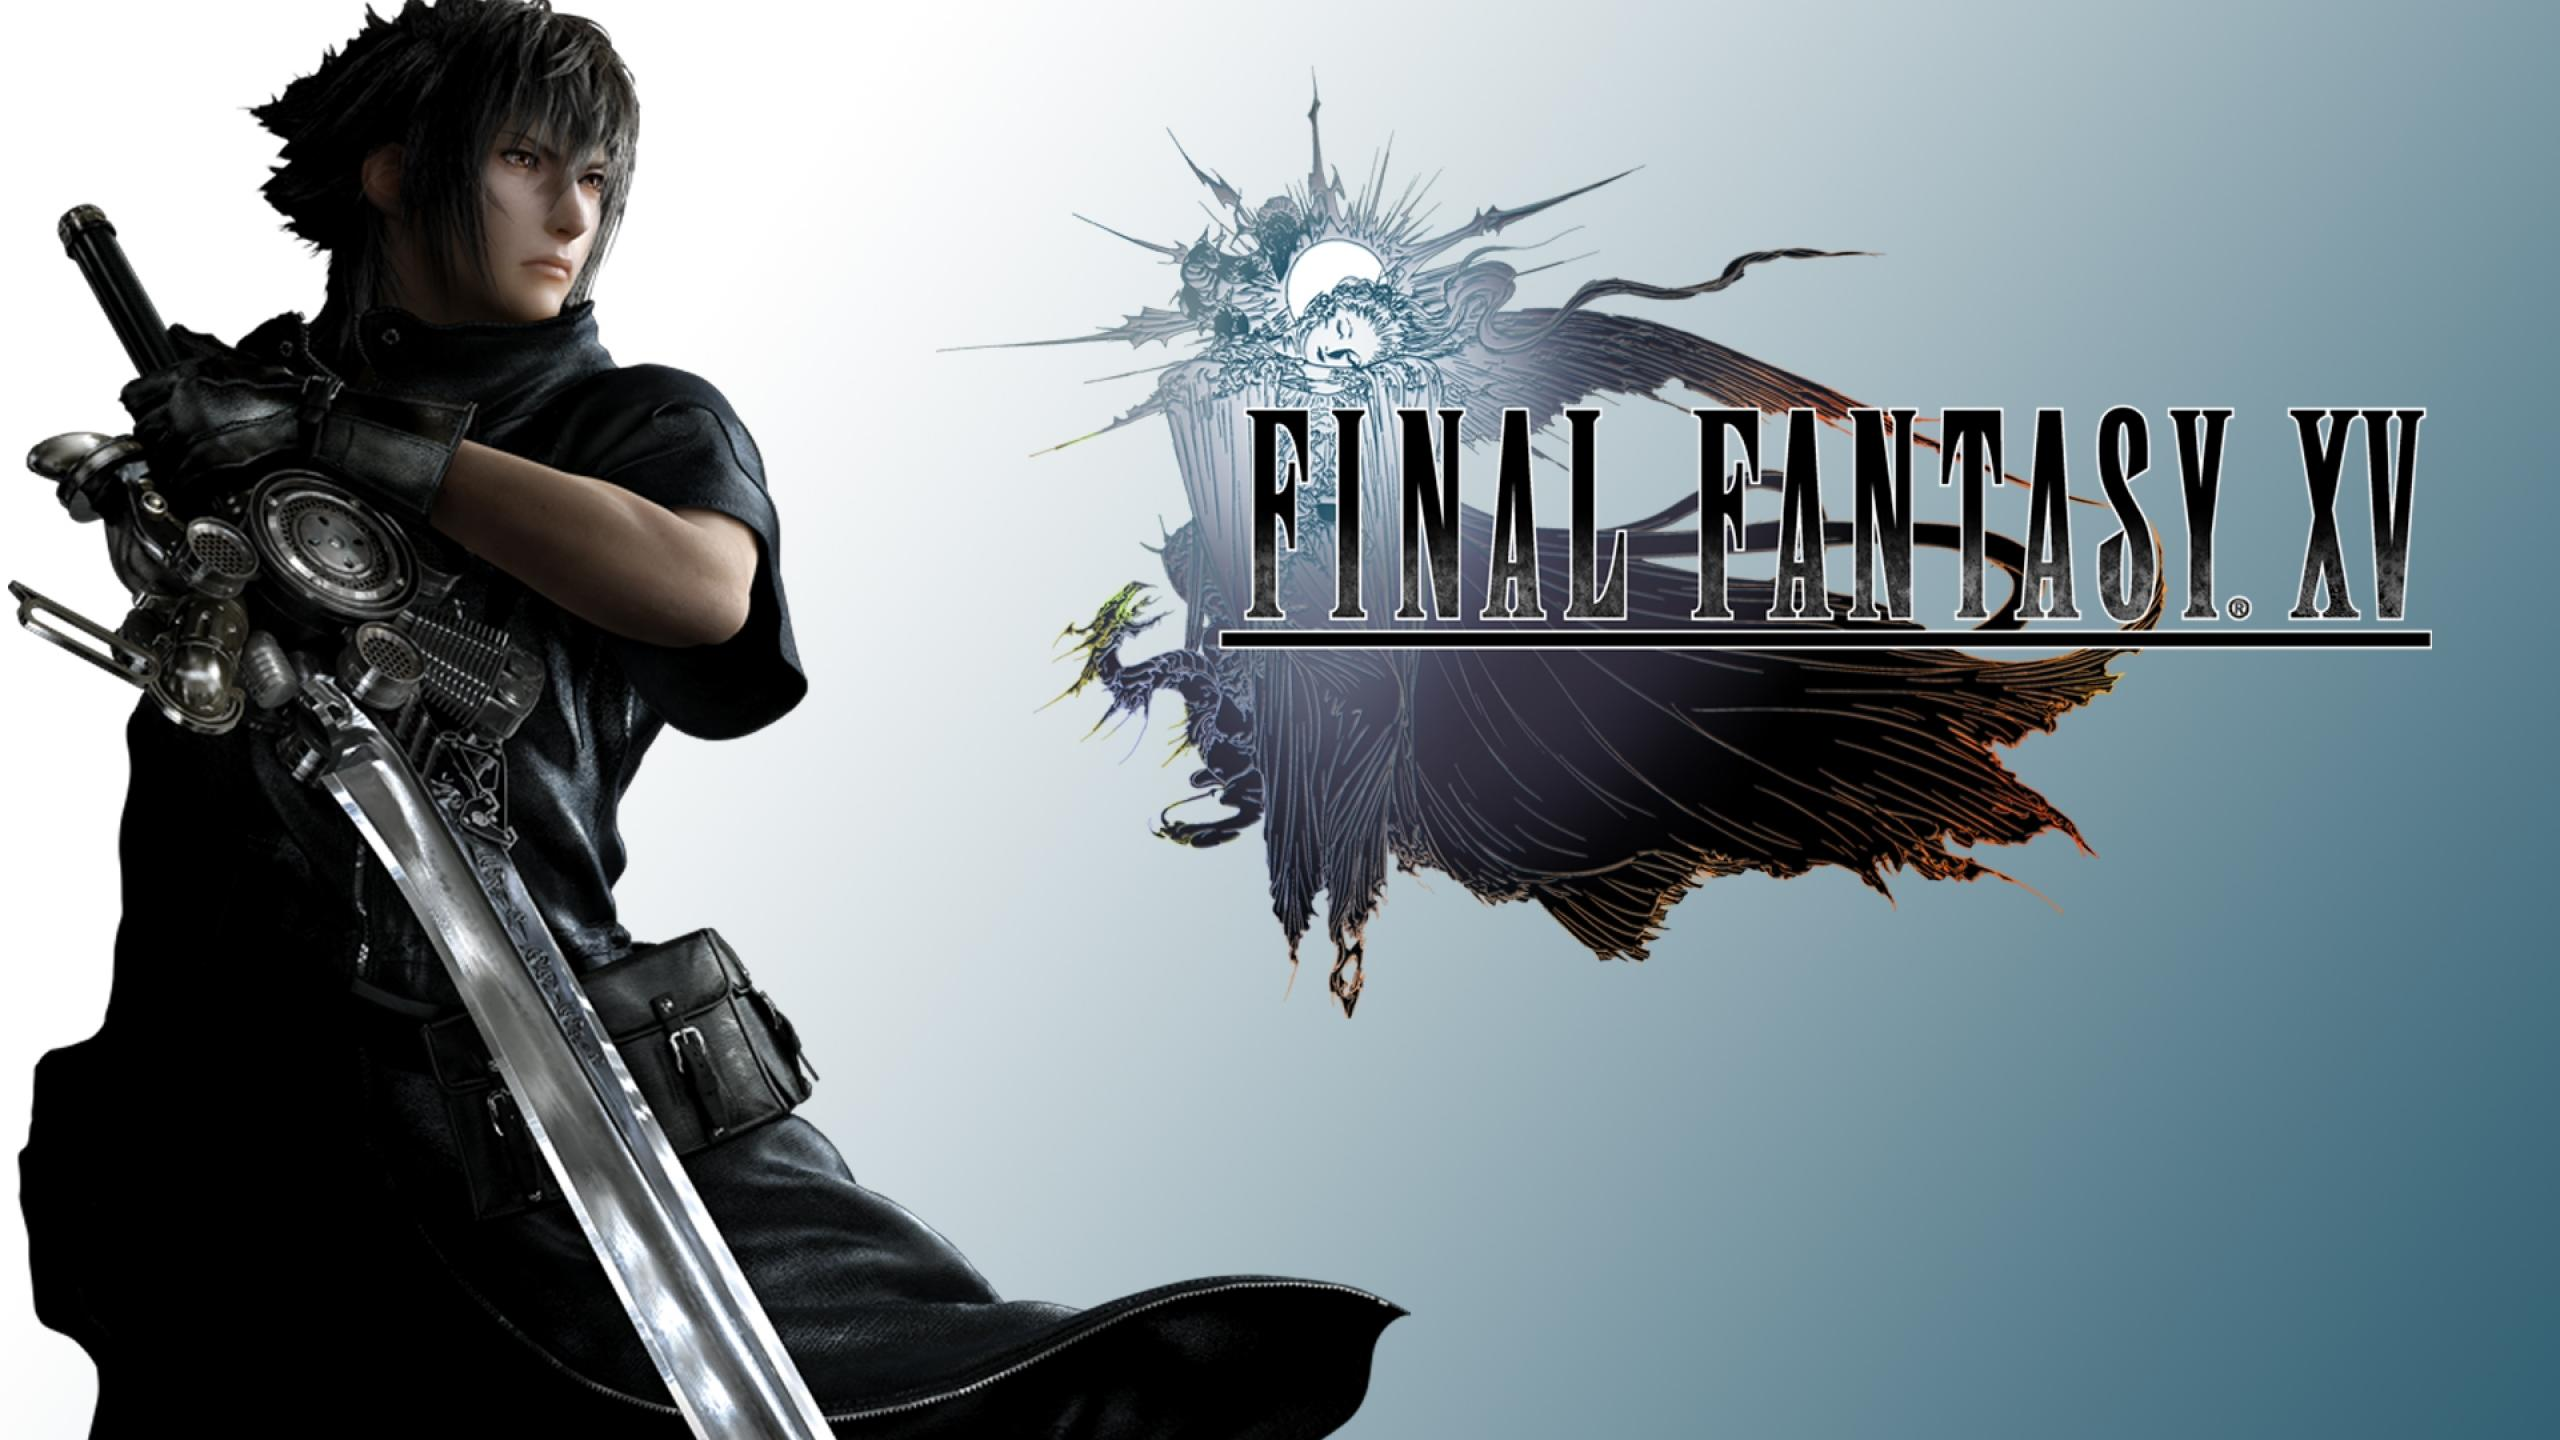 Final Fantasy Xv Wallpapers Top Free Final Fantasy Xv